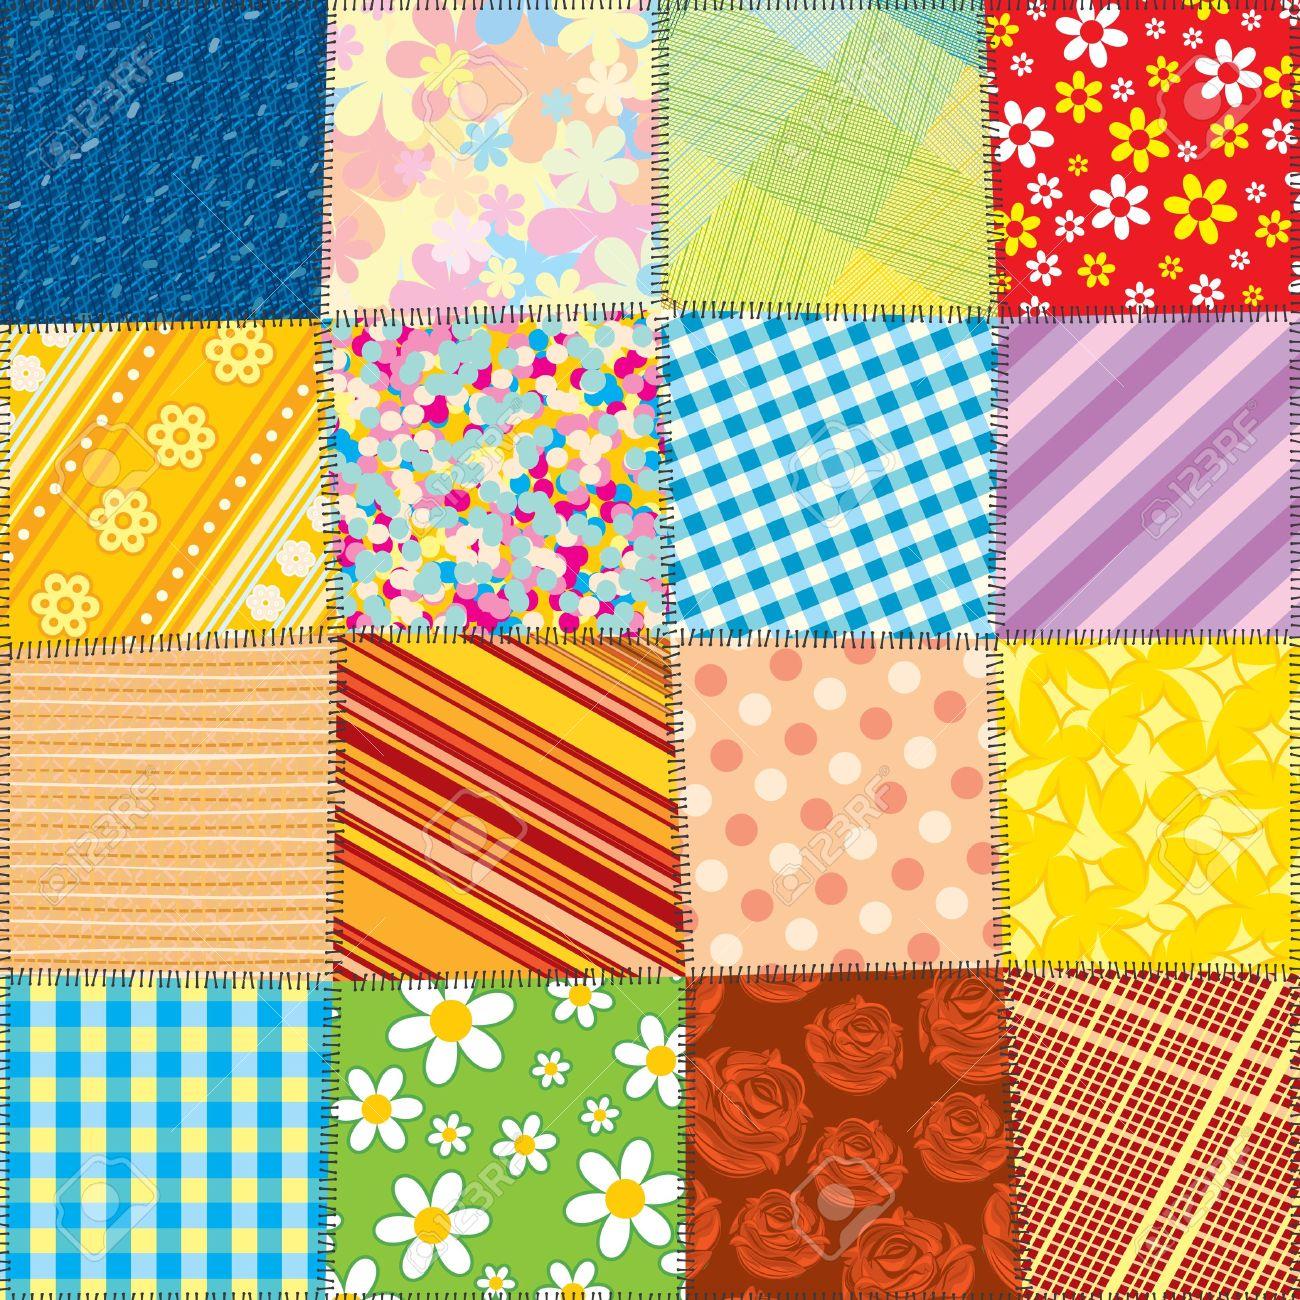 Quilt Patchwork Texture .